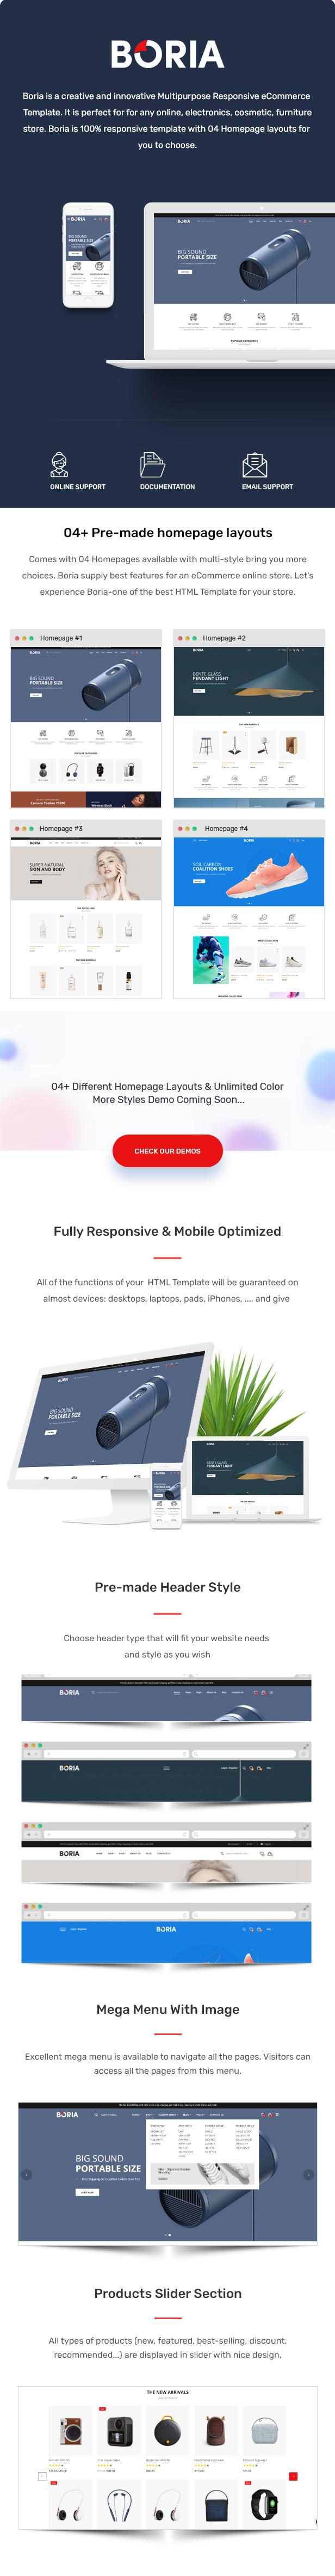 Boria - Multipurpose Responsive eCommerce HTML Template - 1